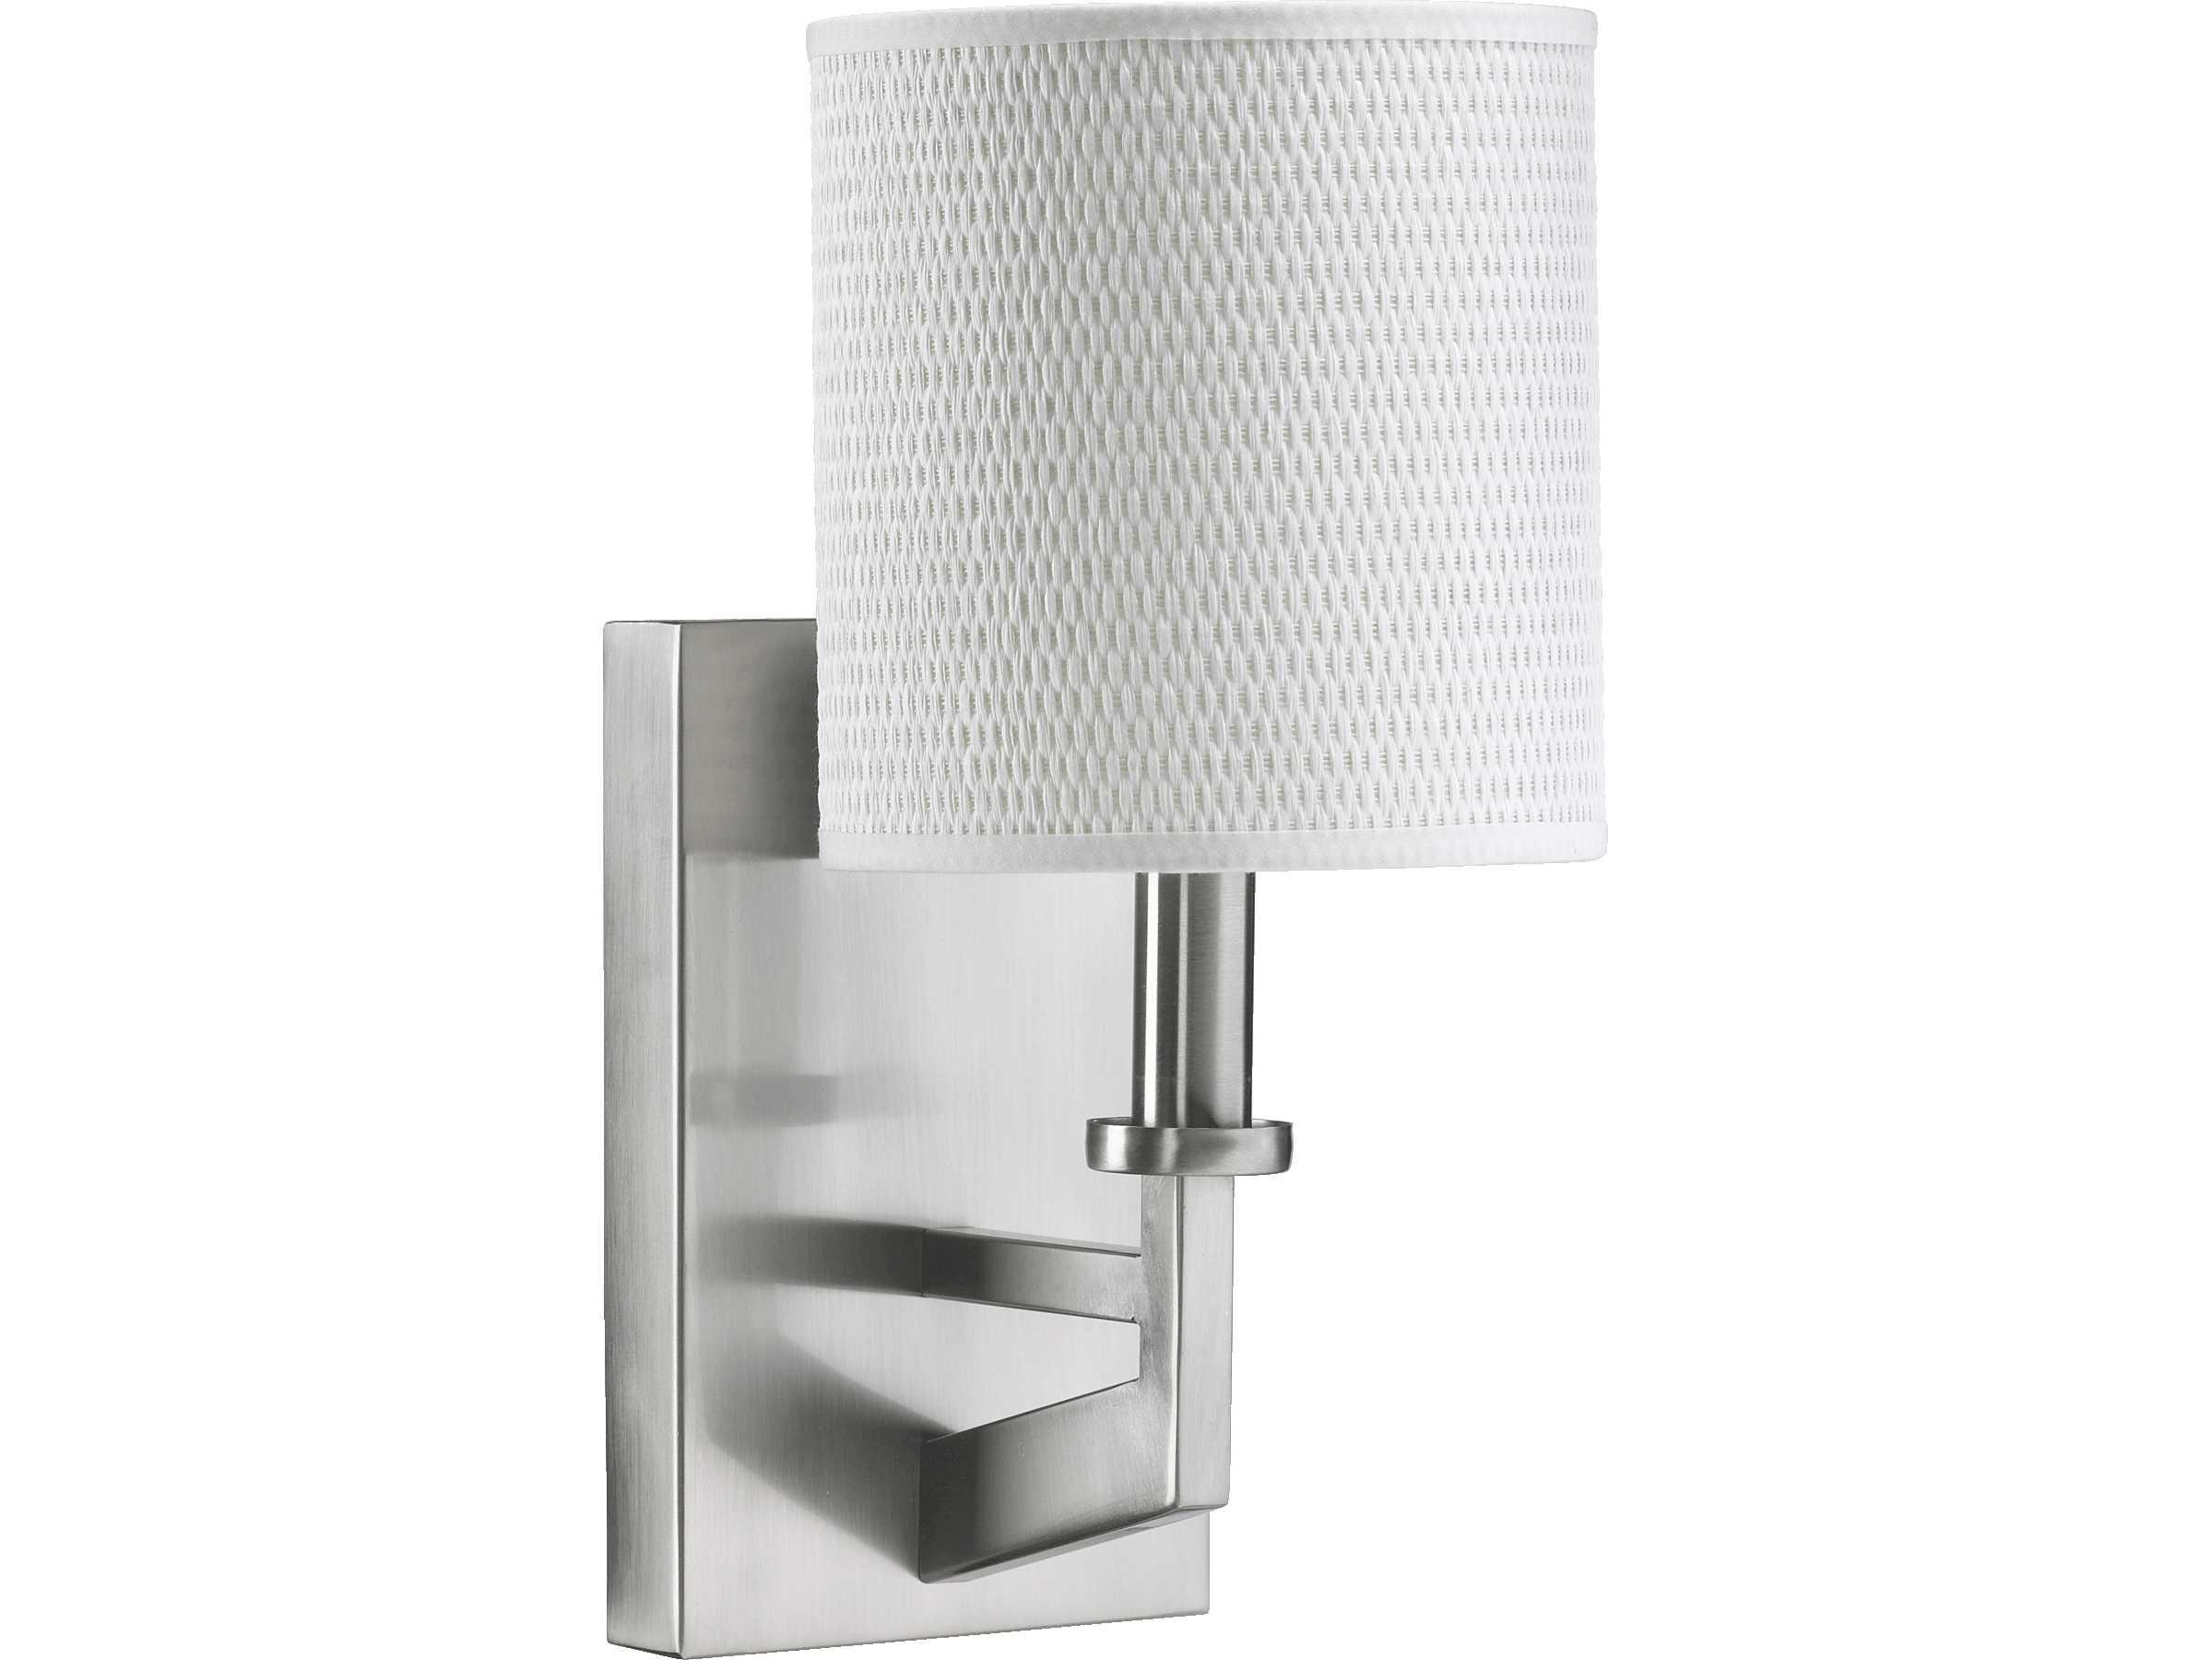 Quorum international channing satin nickel wall sconce for International decor wall lights